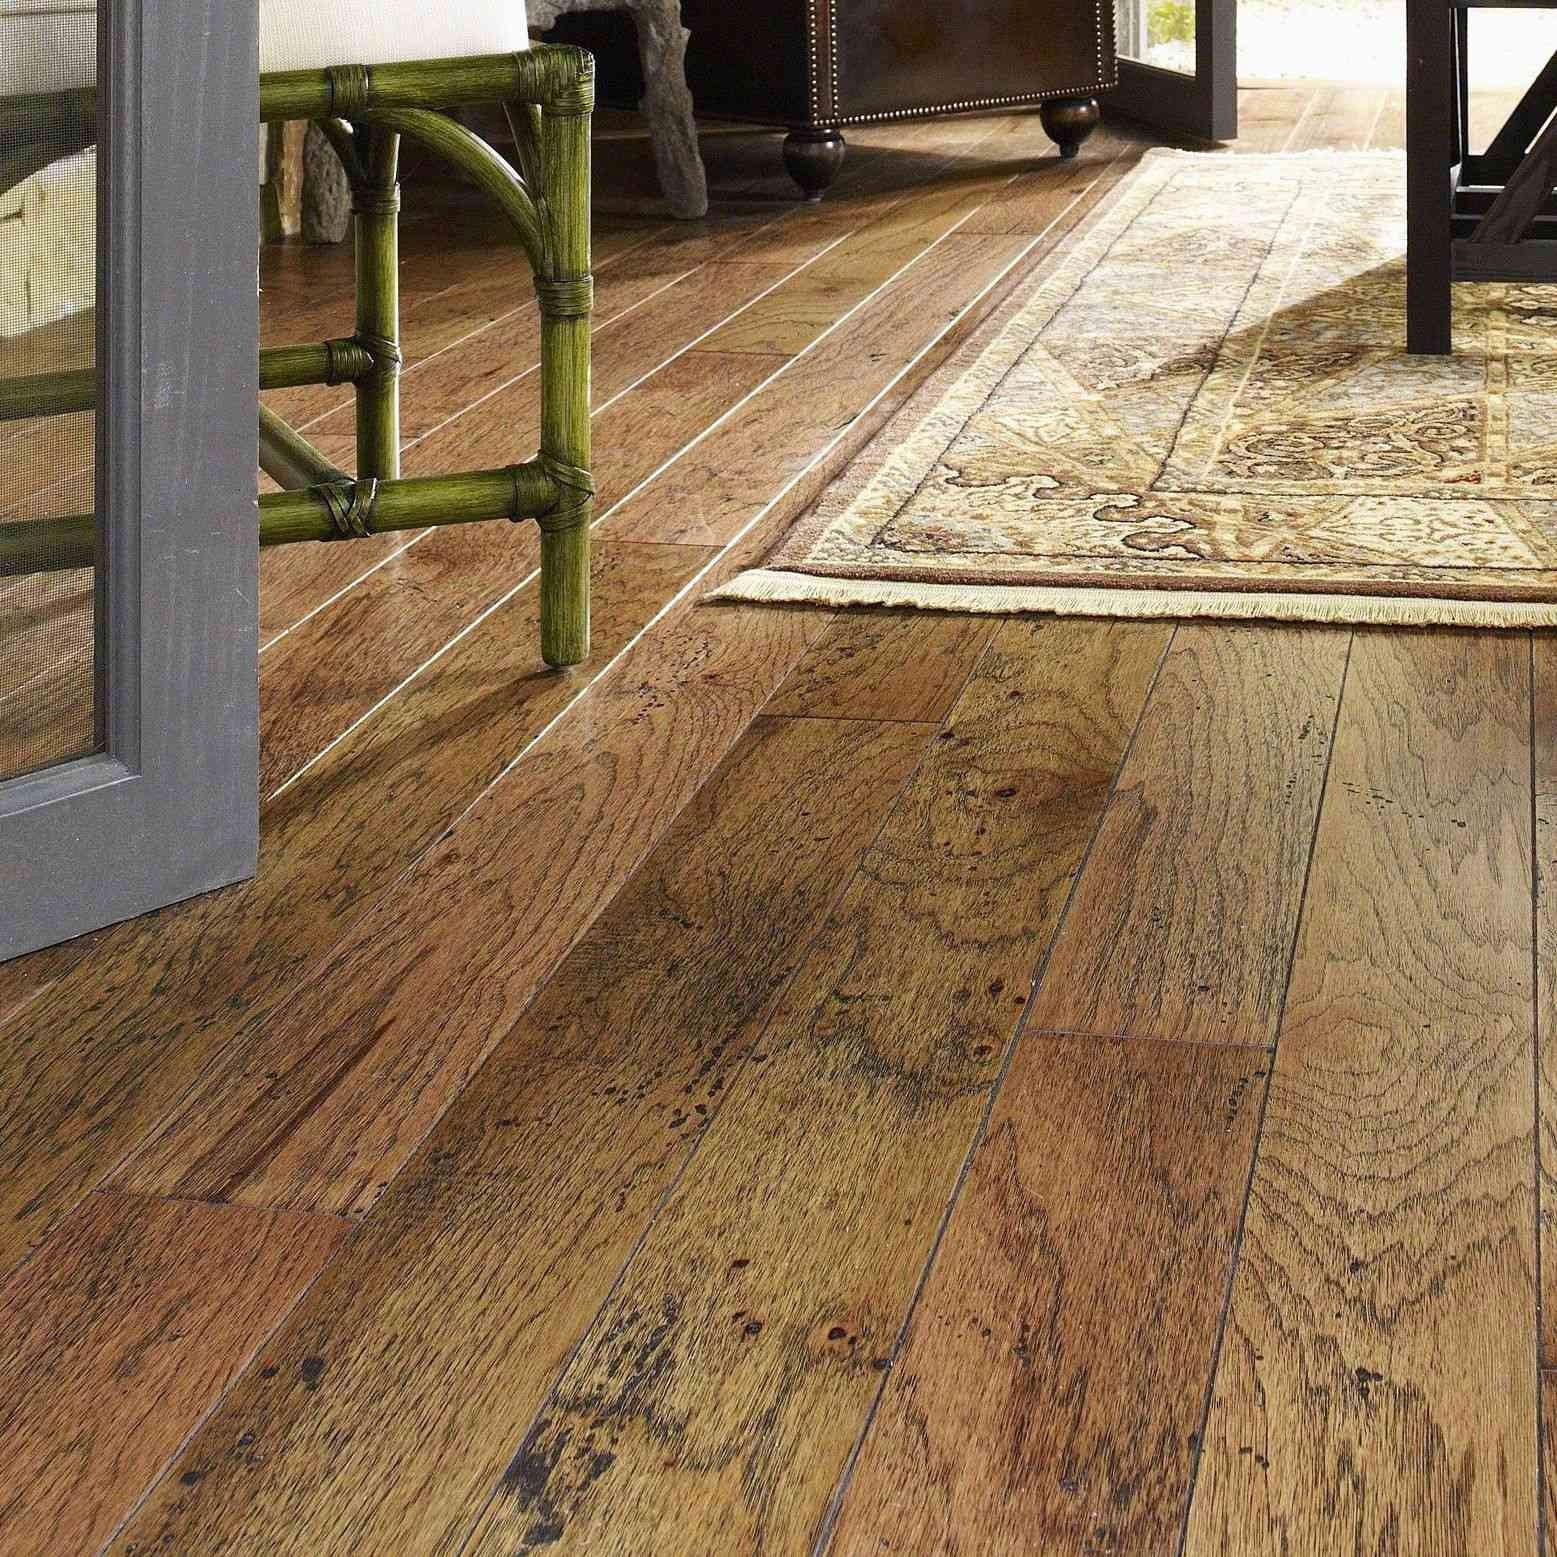 hardwood floor finish restorer of 17 new laminate hardwood pics dizpos com pertaining to laminate hardwood best of 50 best how to get wax f hardwood floors graphics 50 s